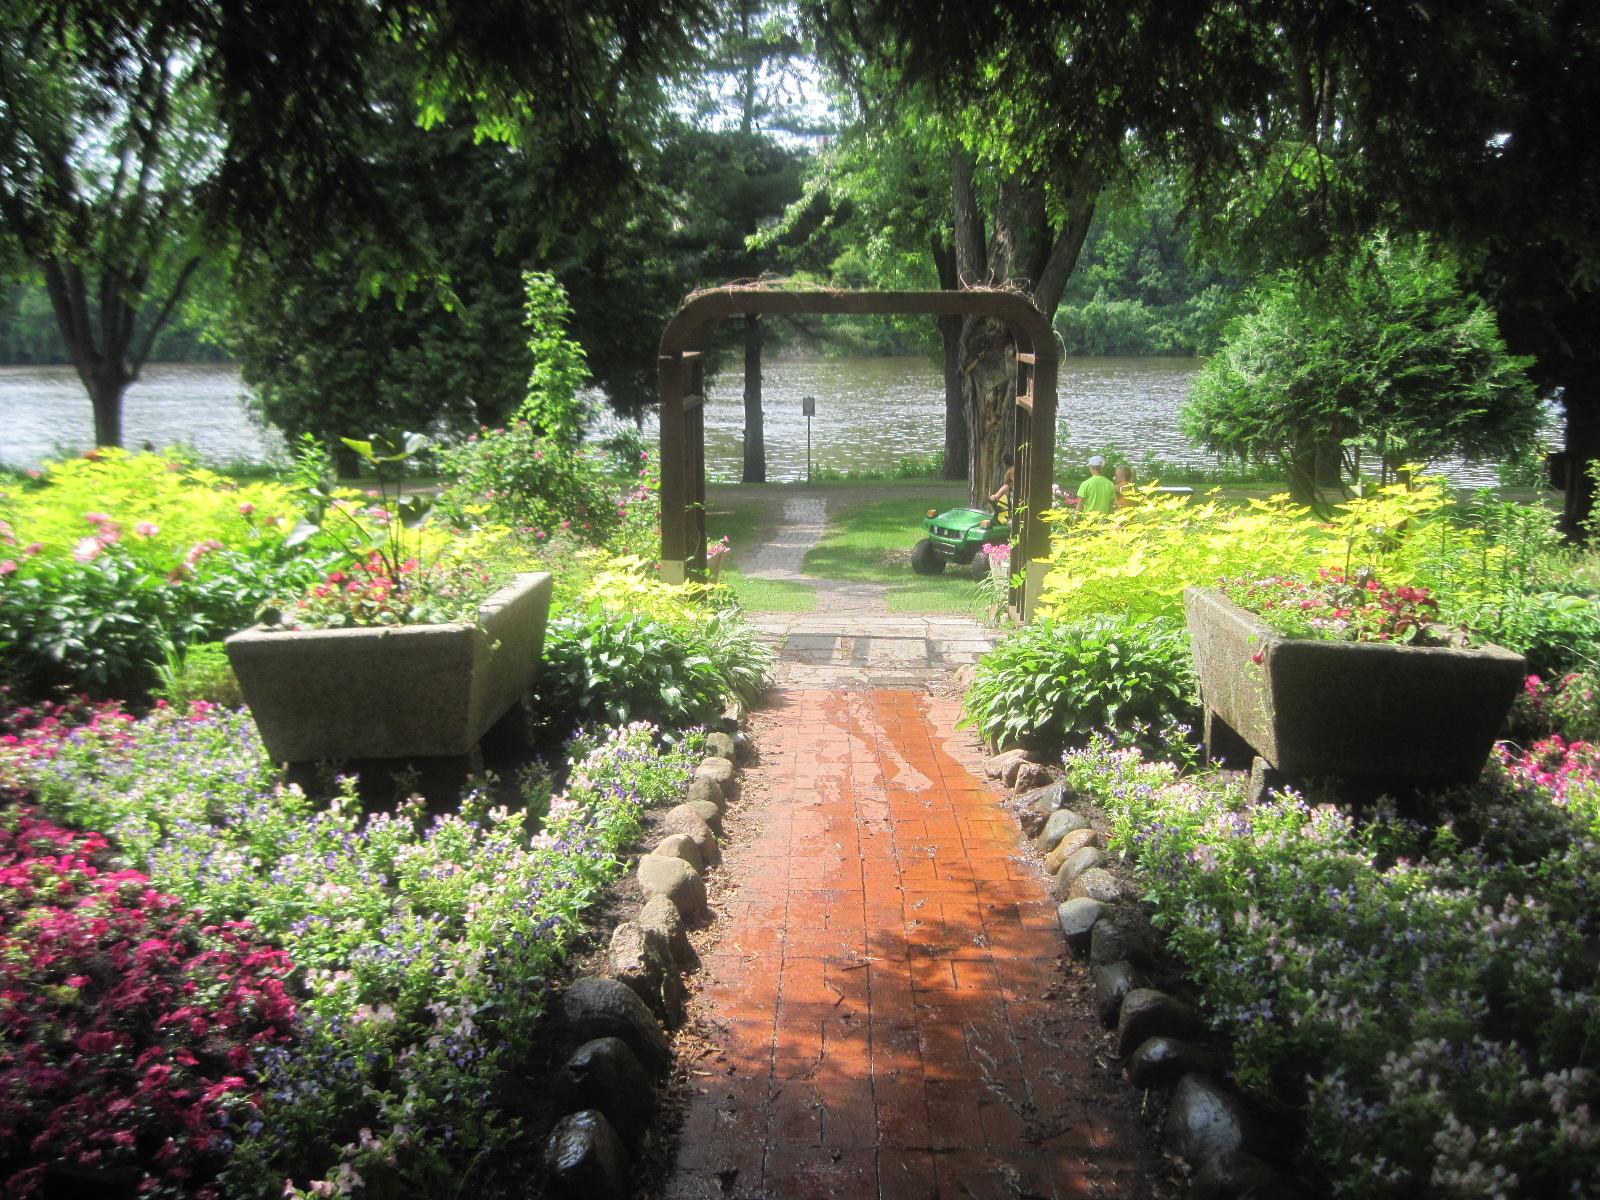 The Schramm Journey Munsinger And Clemens Gardens Of St Cloud